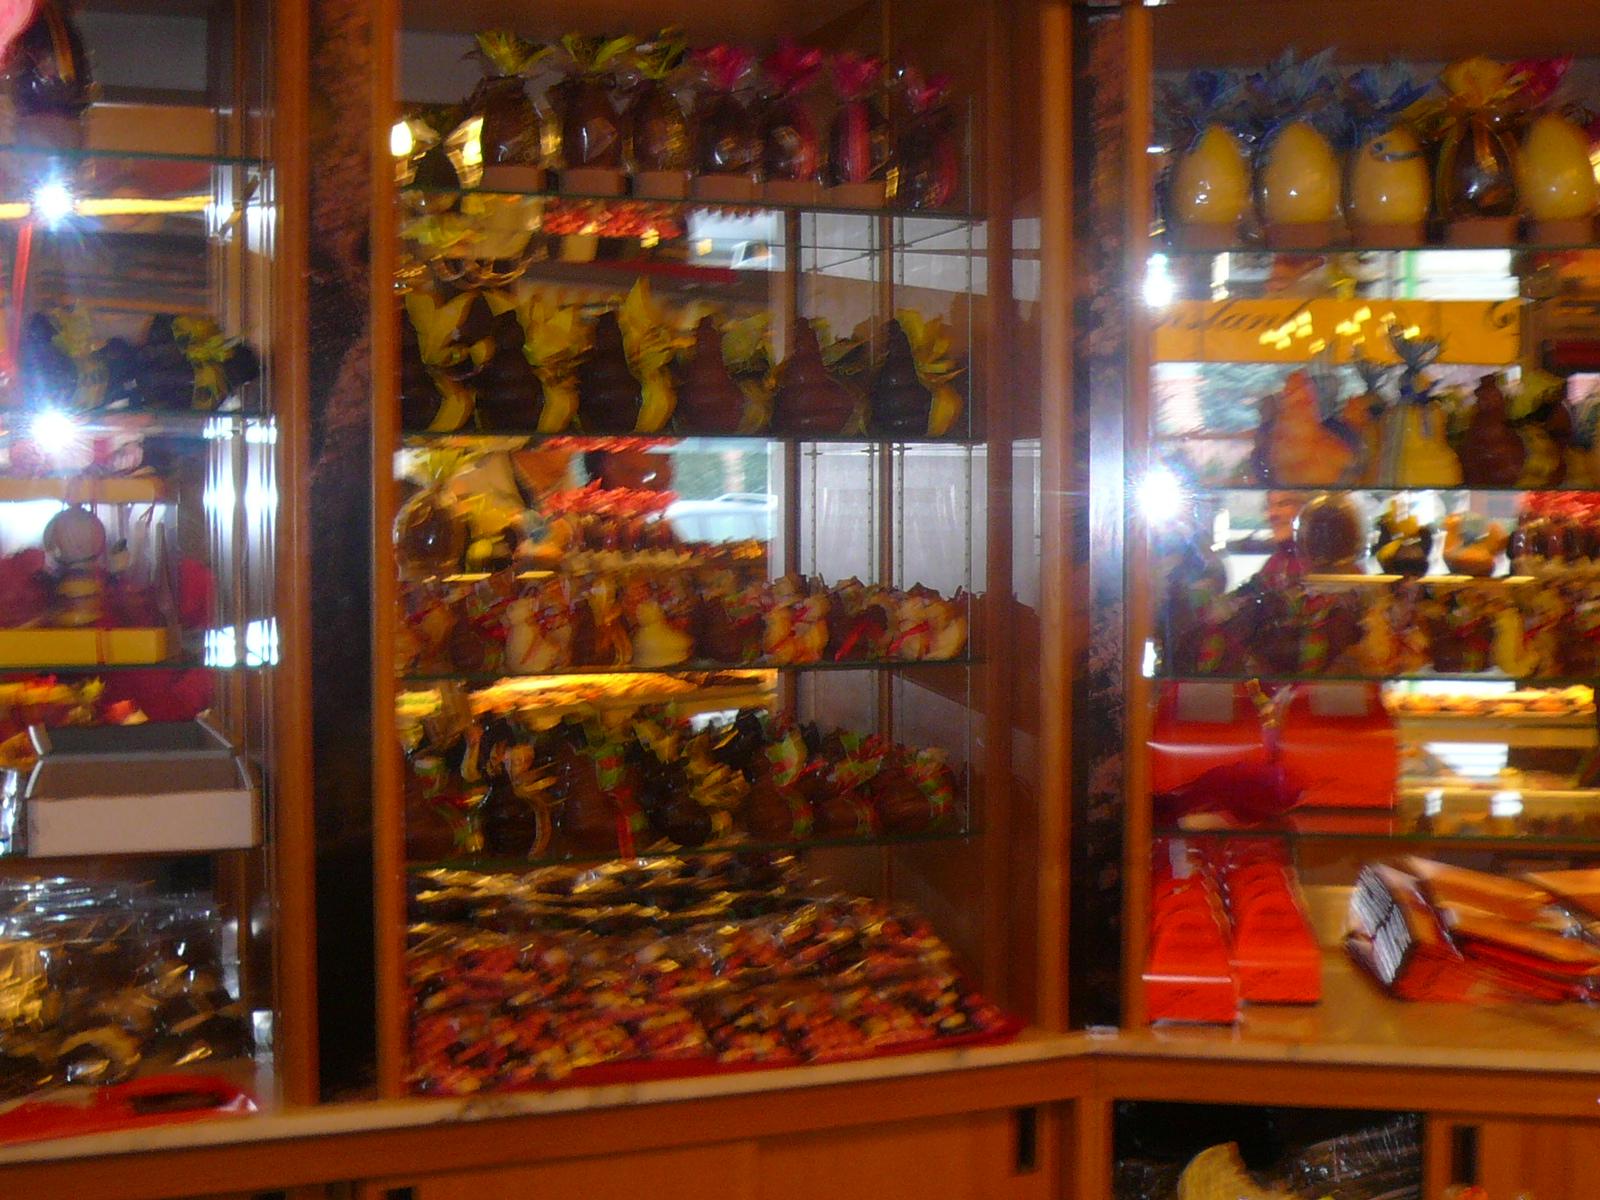 Scrapretty joyeuses fetes de paques - Joyeuses fetes magasin ...